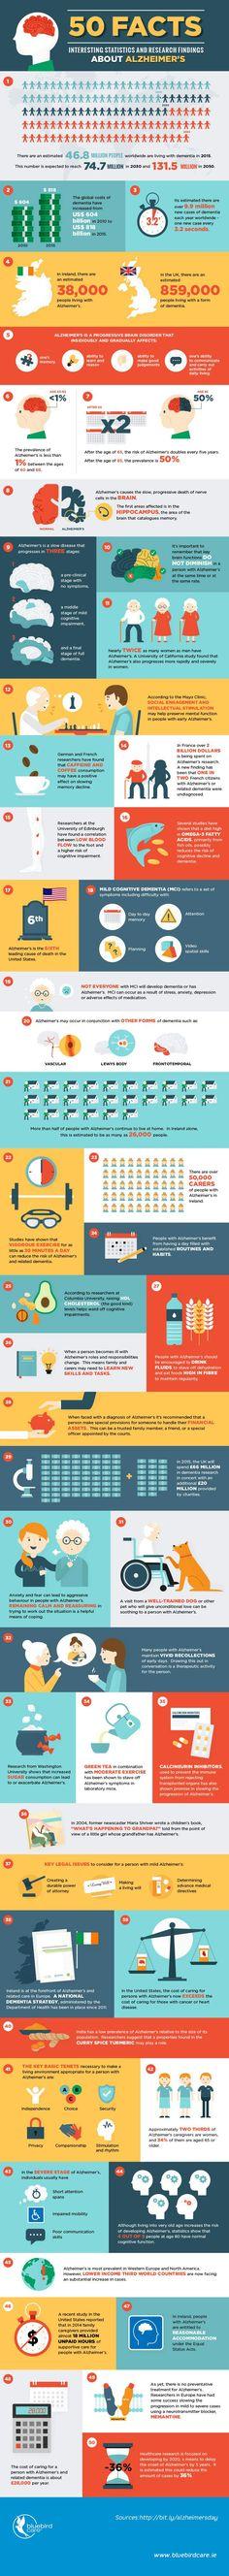 50 Facts about Alzheimer's #infographic #Health #Alzheimer's